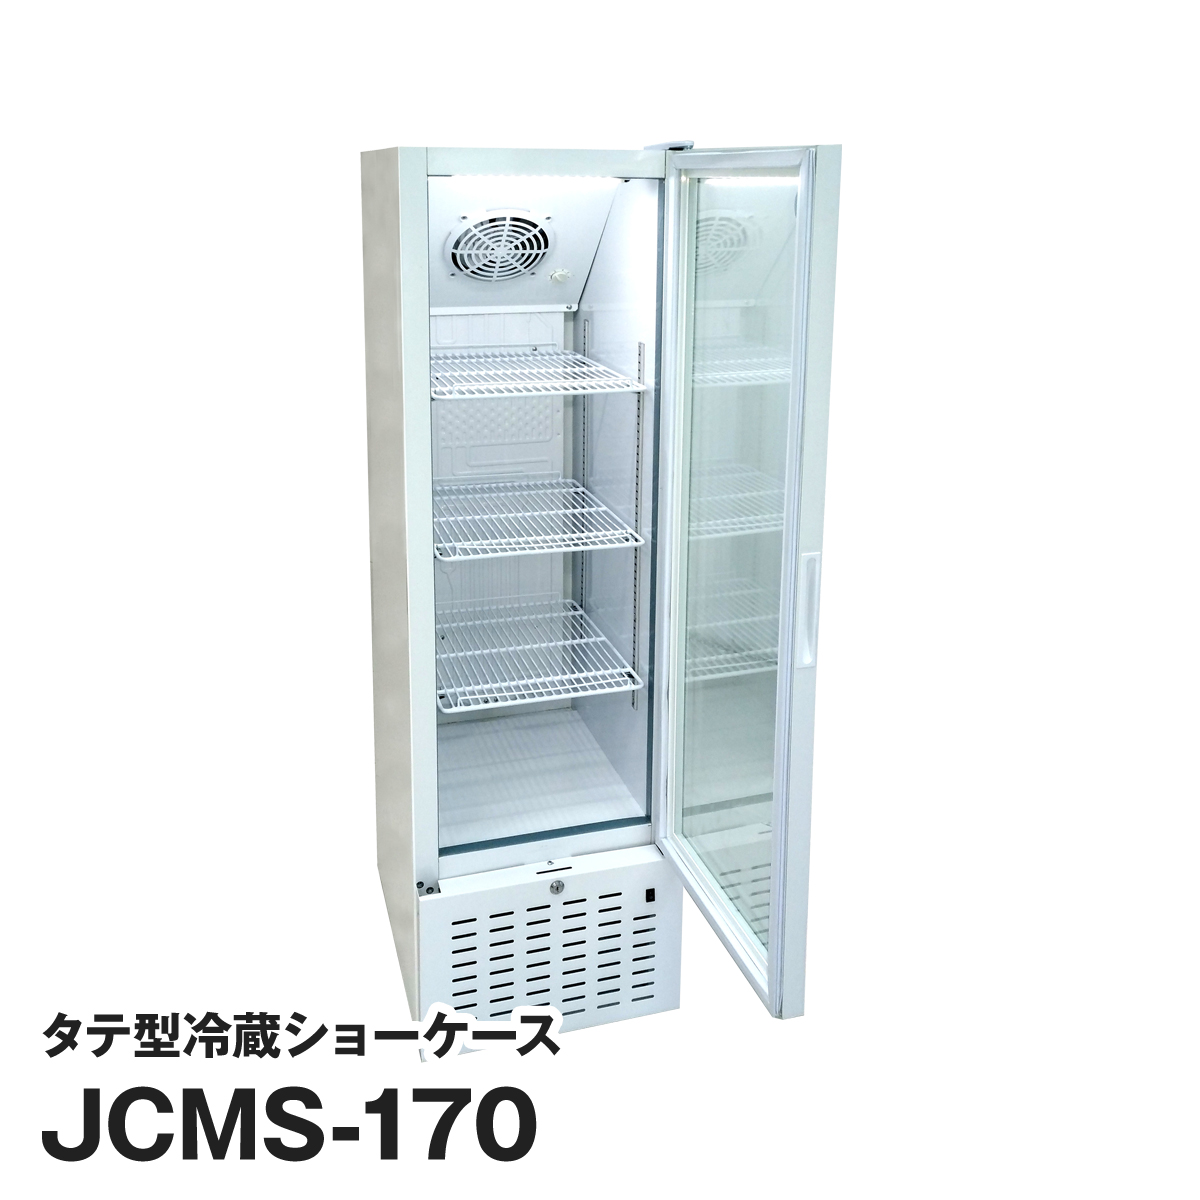 JCM社製 業務用 保冷庫 冷蔵庫 170L タテ型 冷蔵 ショーケース (両面扉) JCMS-170 新品